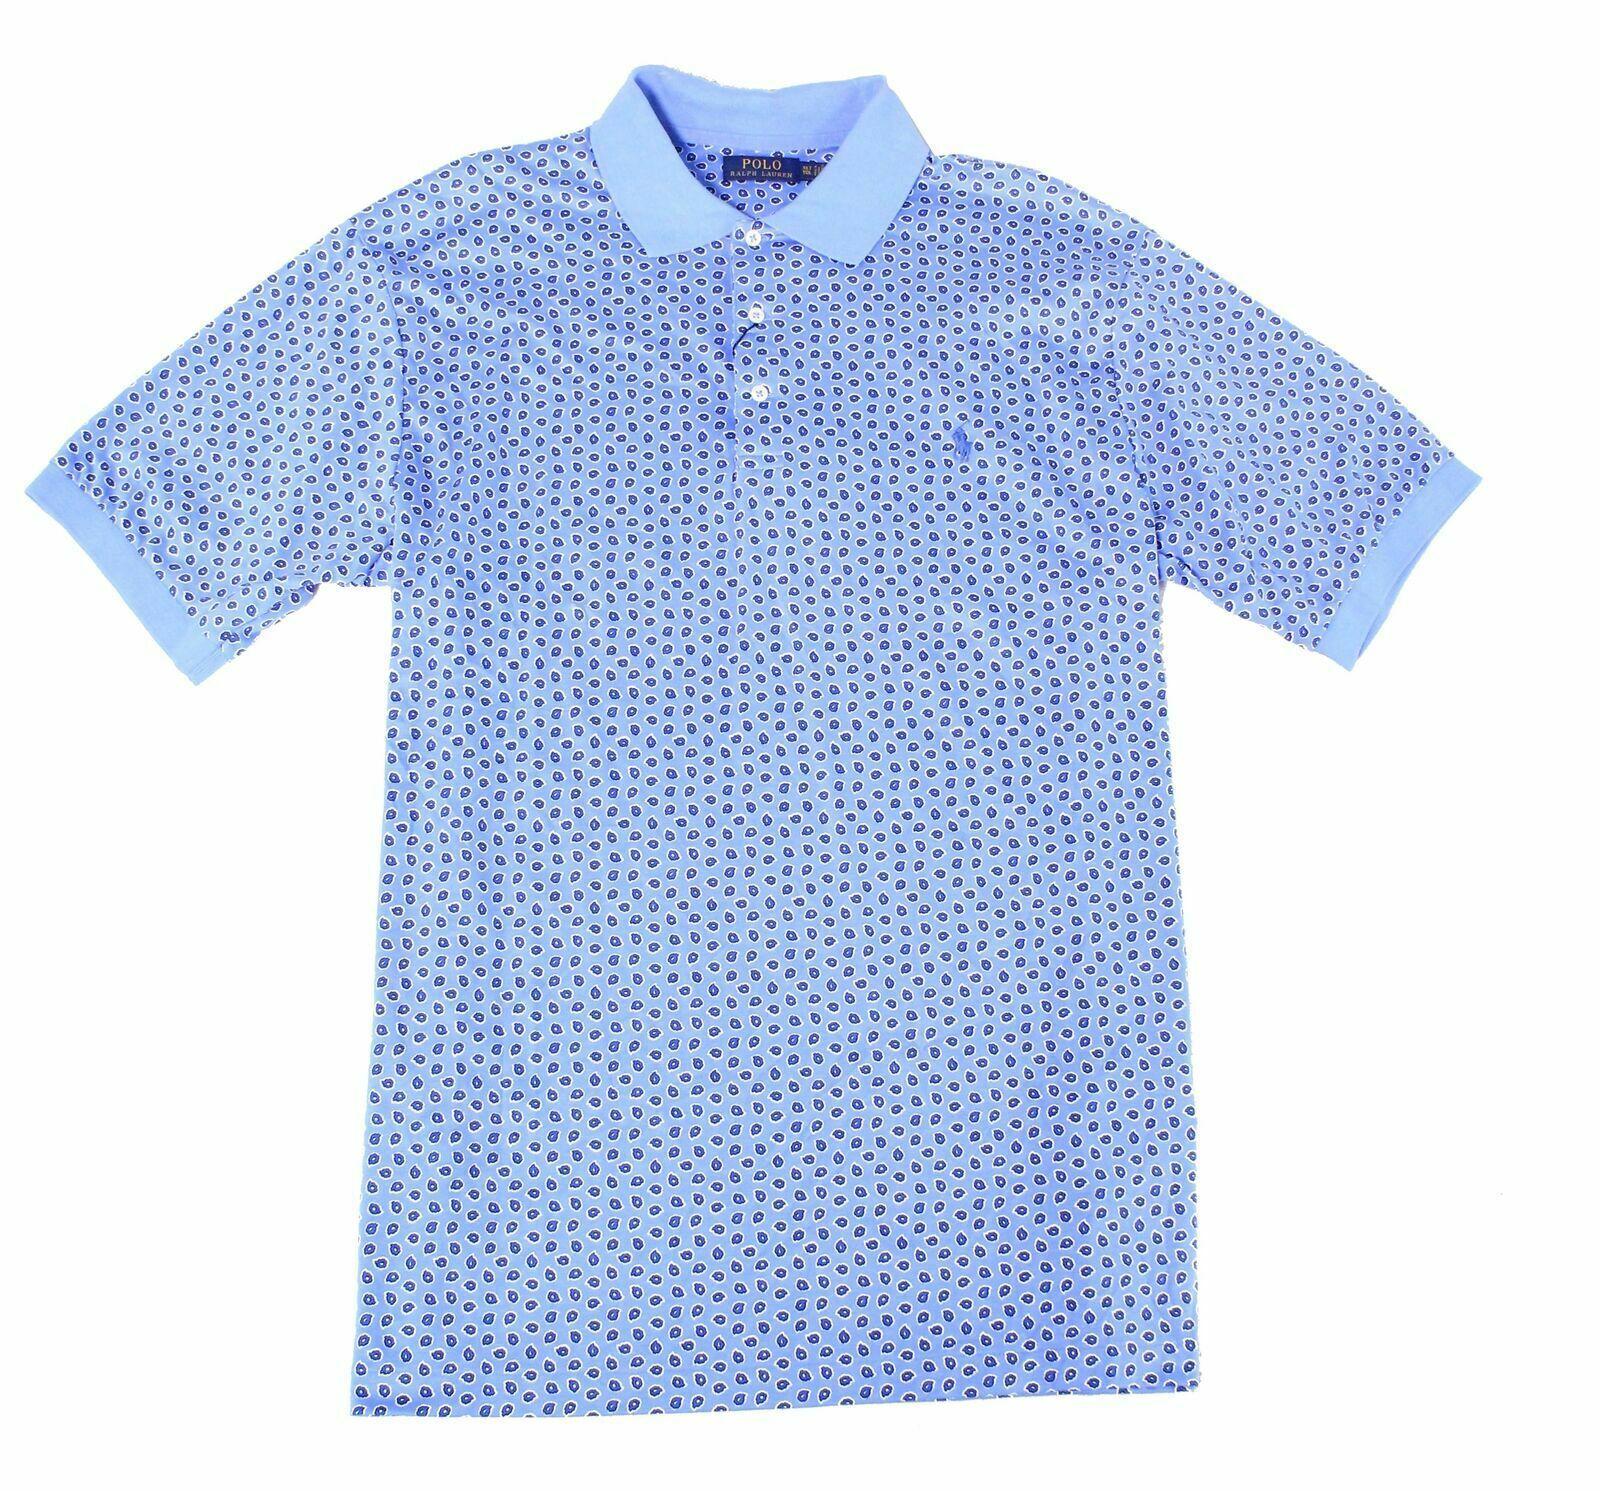 NWT $98 Polo Ralph Lauren Short Sleeve Shirt Mens LT 2XLT  Blue Plaid Cotton NEW